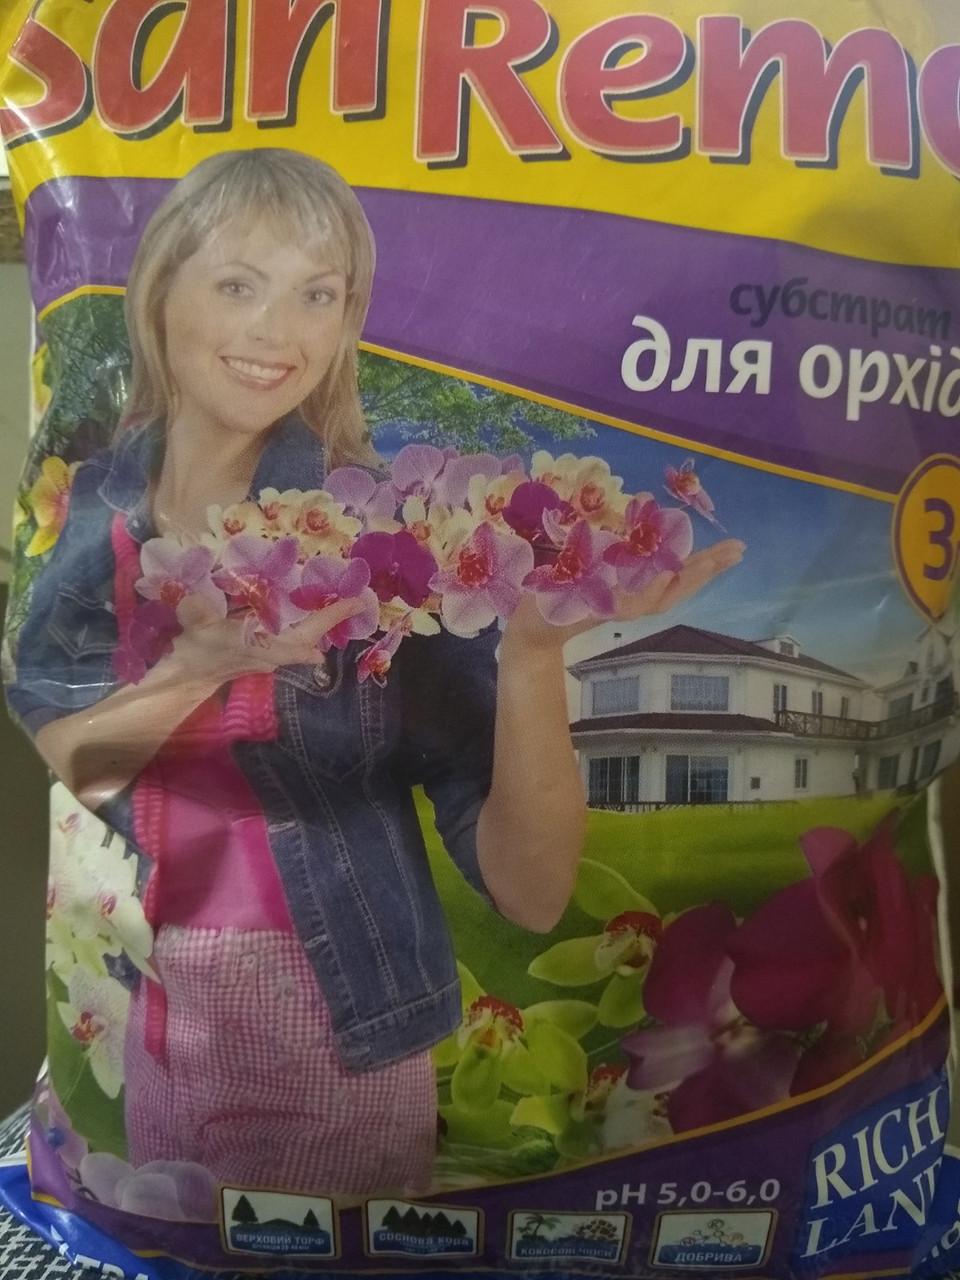 Субстрат для орхидеи Sun Remo Rich Land  Рич Ленд 3 литра Украина